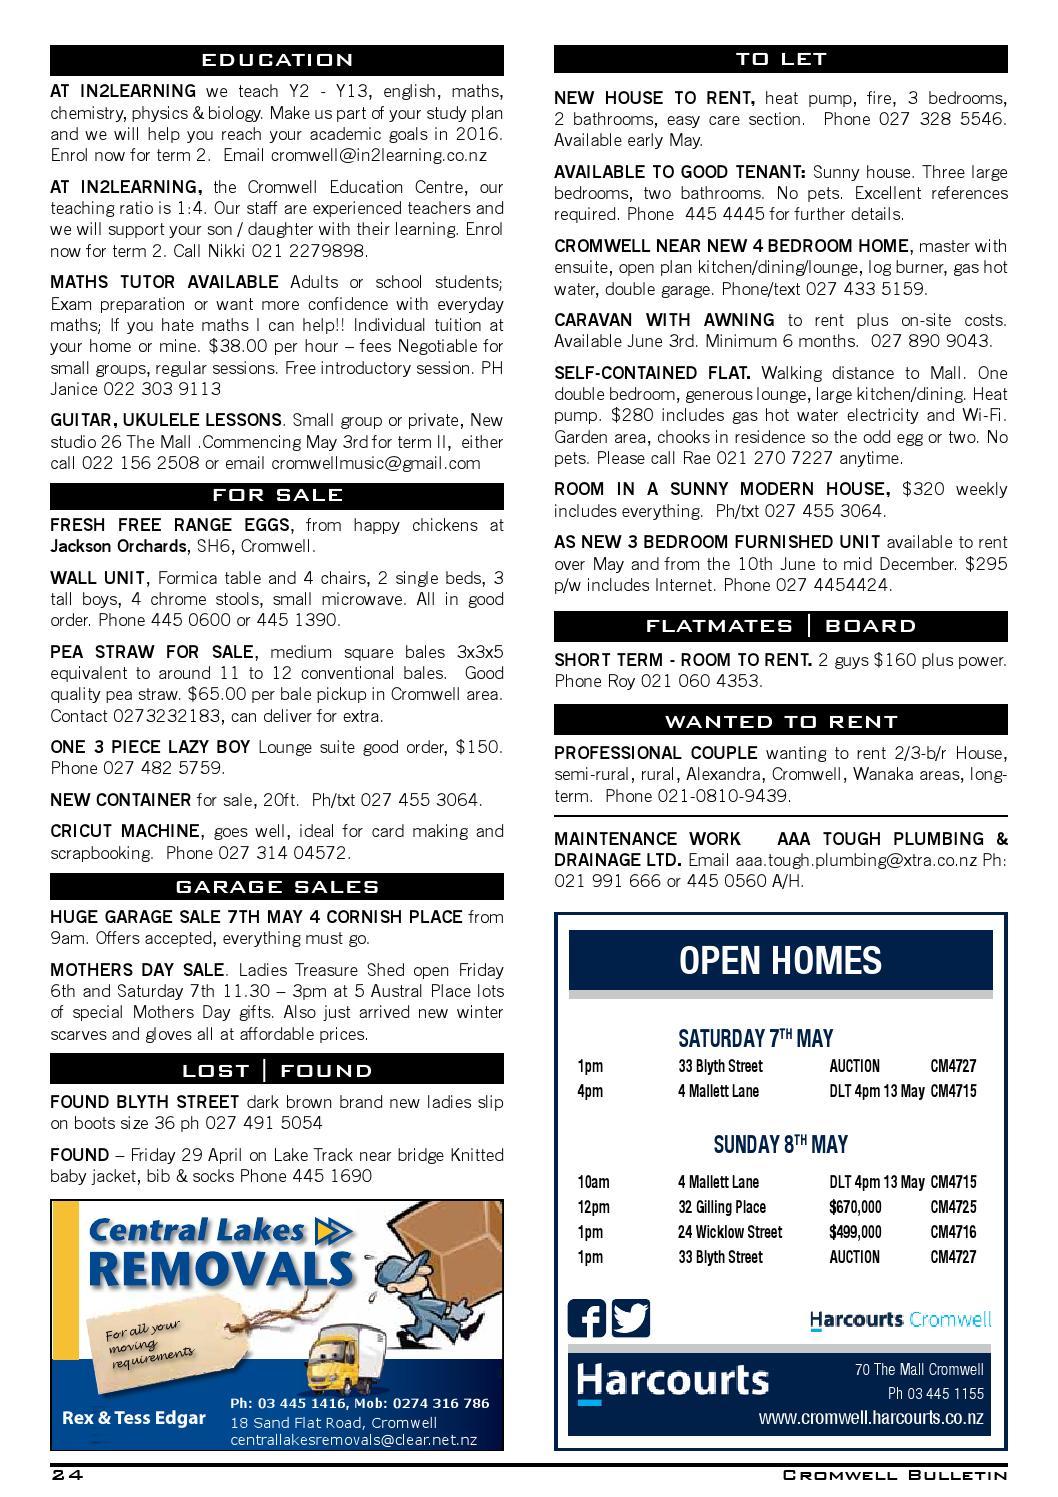 8d30e63246f48 Bulletin 1478 by Cromwell Bulletin - issuu